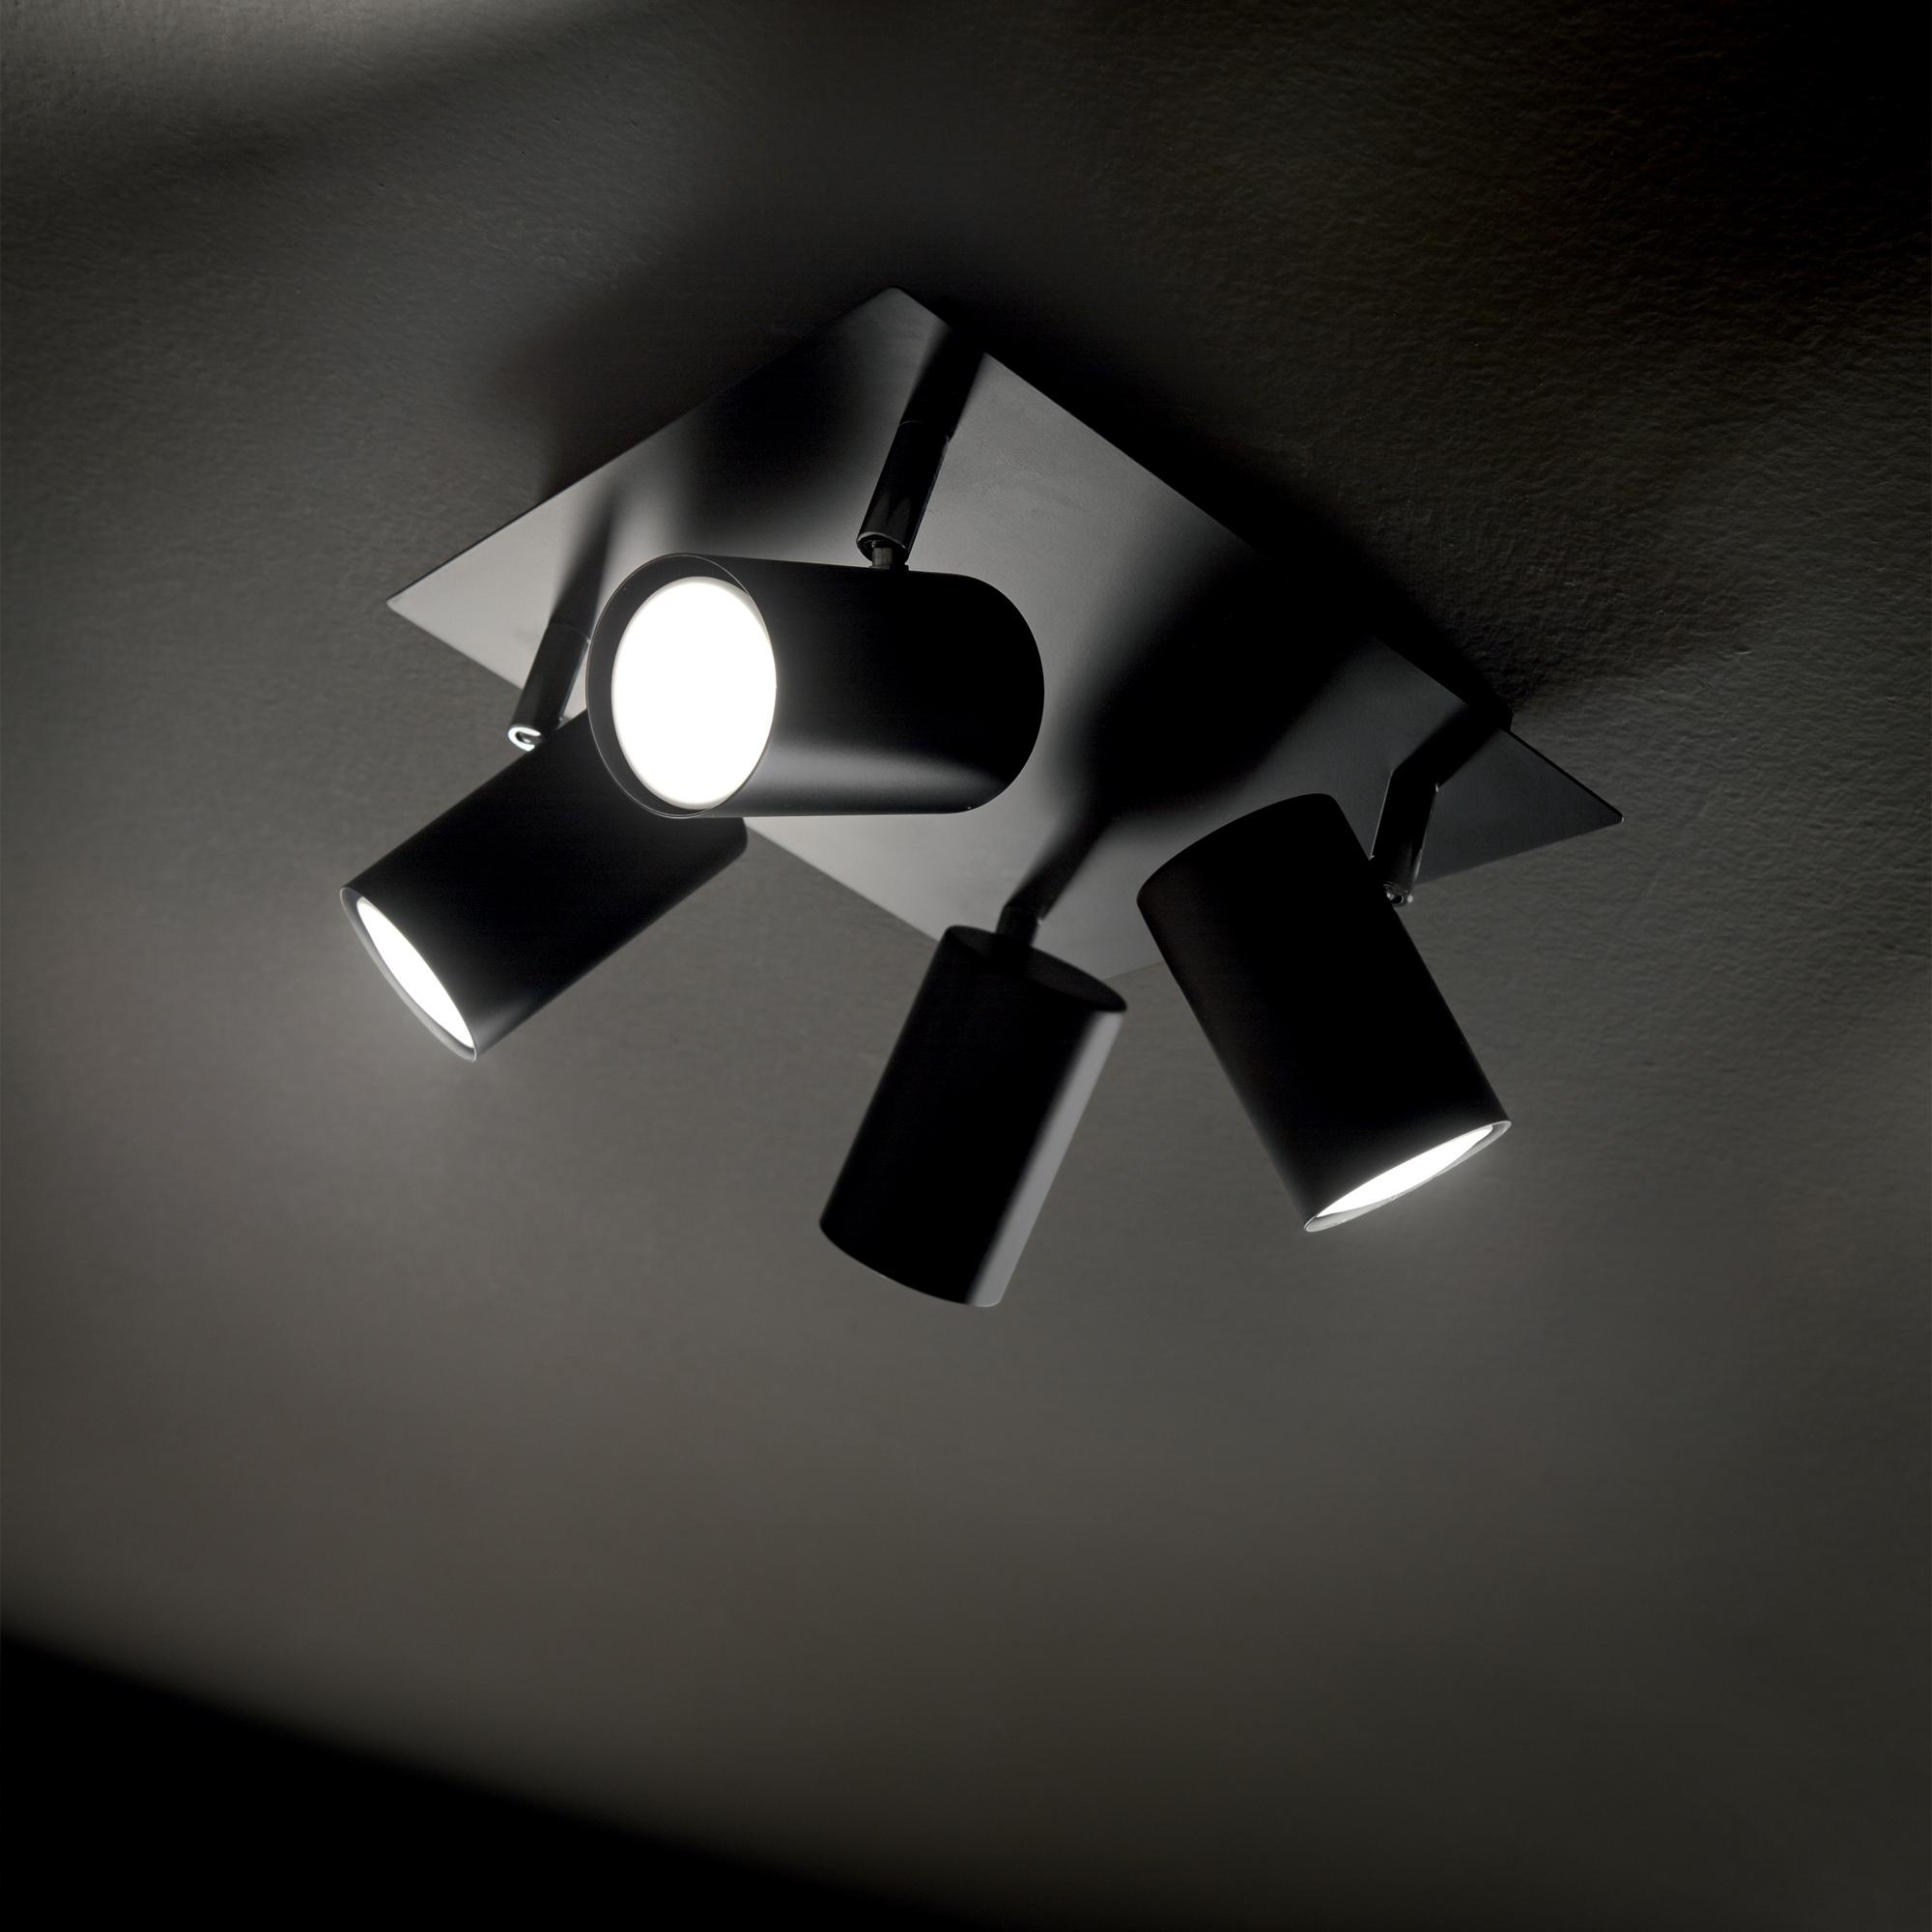 Ideal Lux 156781 SPOT PL4 NERO 4 izzós spot mennyezeti lámpa